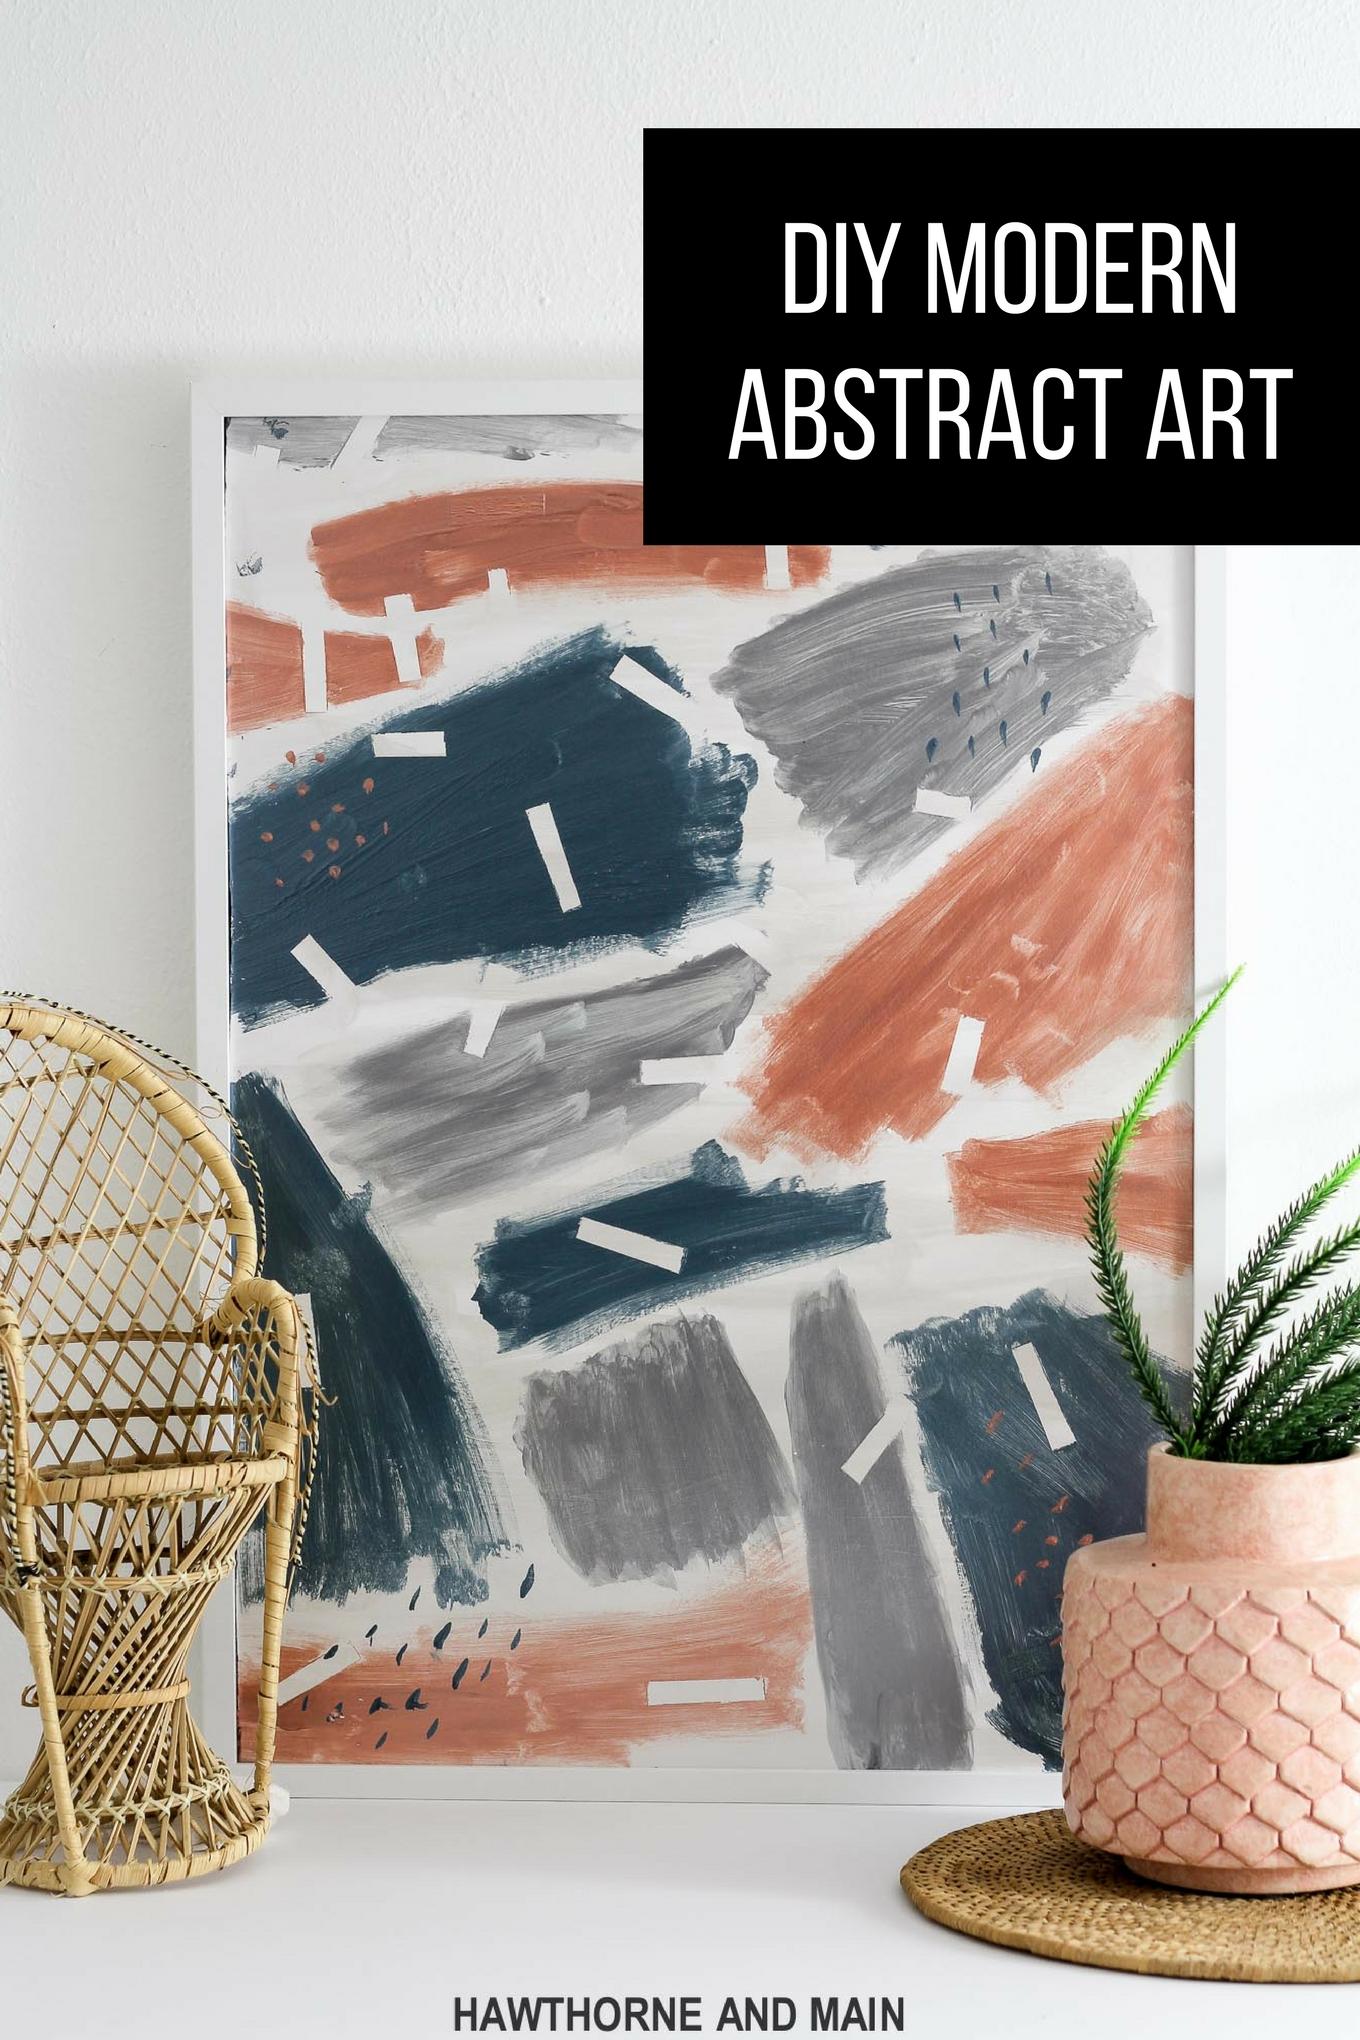 DIY Modern Abstract Art – HAWTHORNE AND MAIN